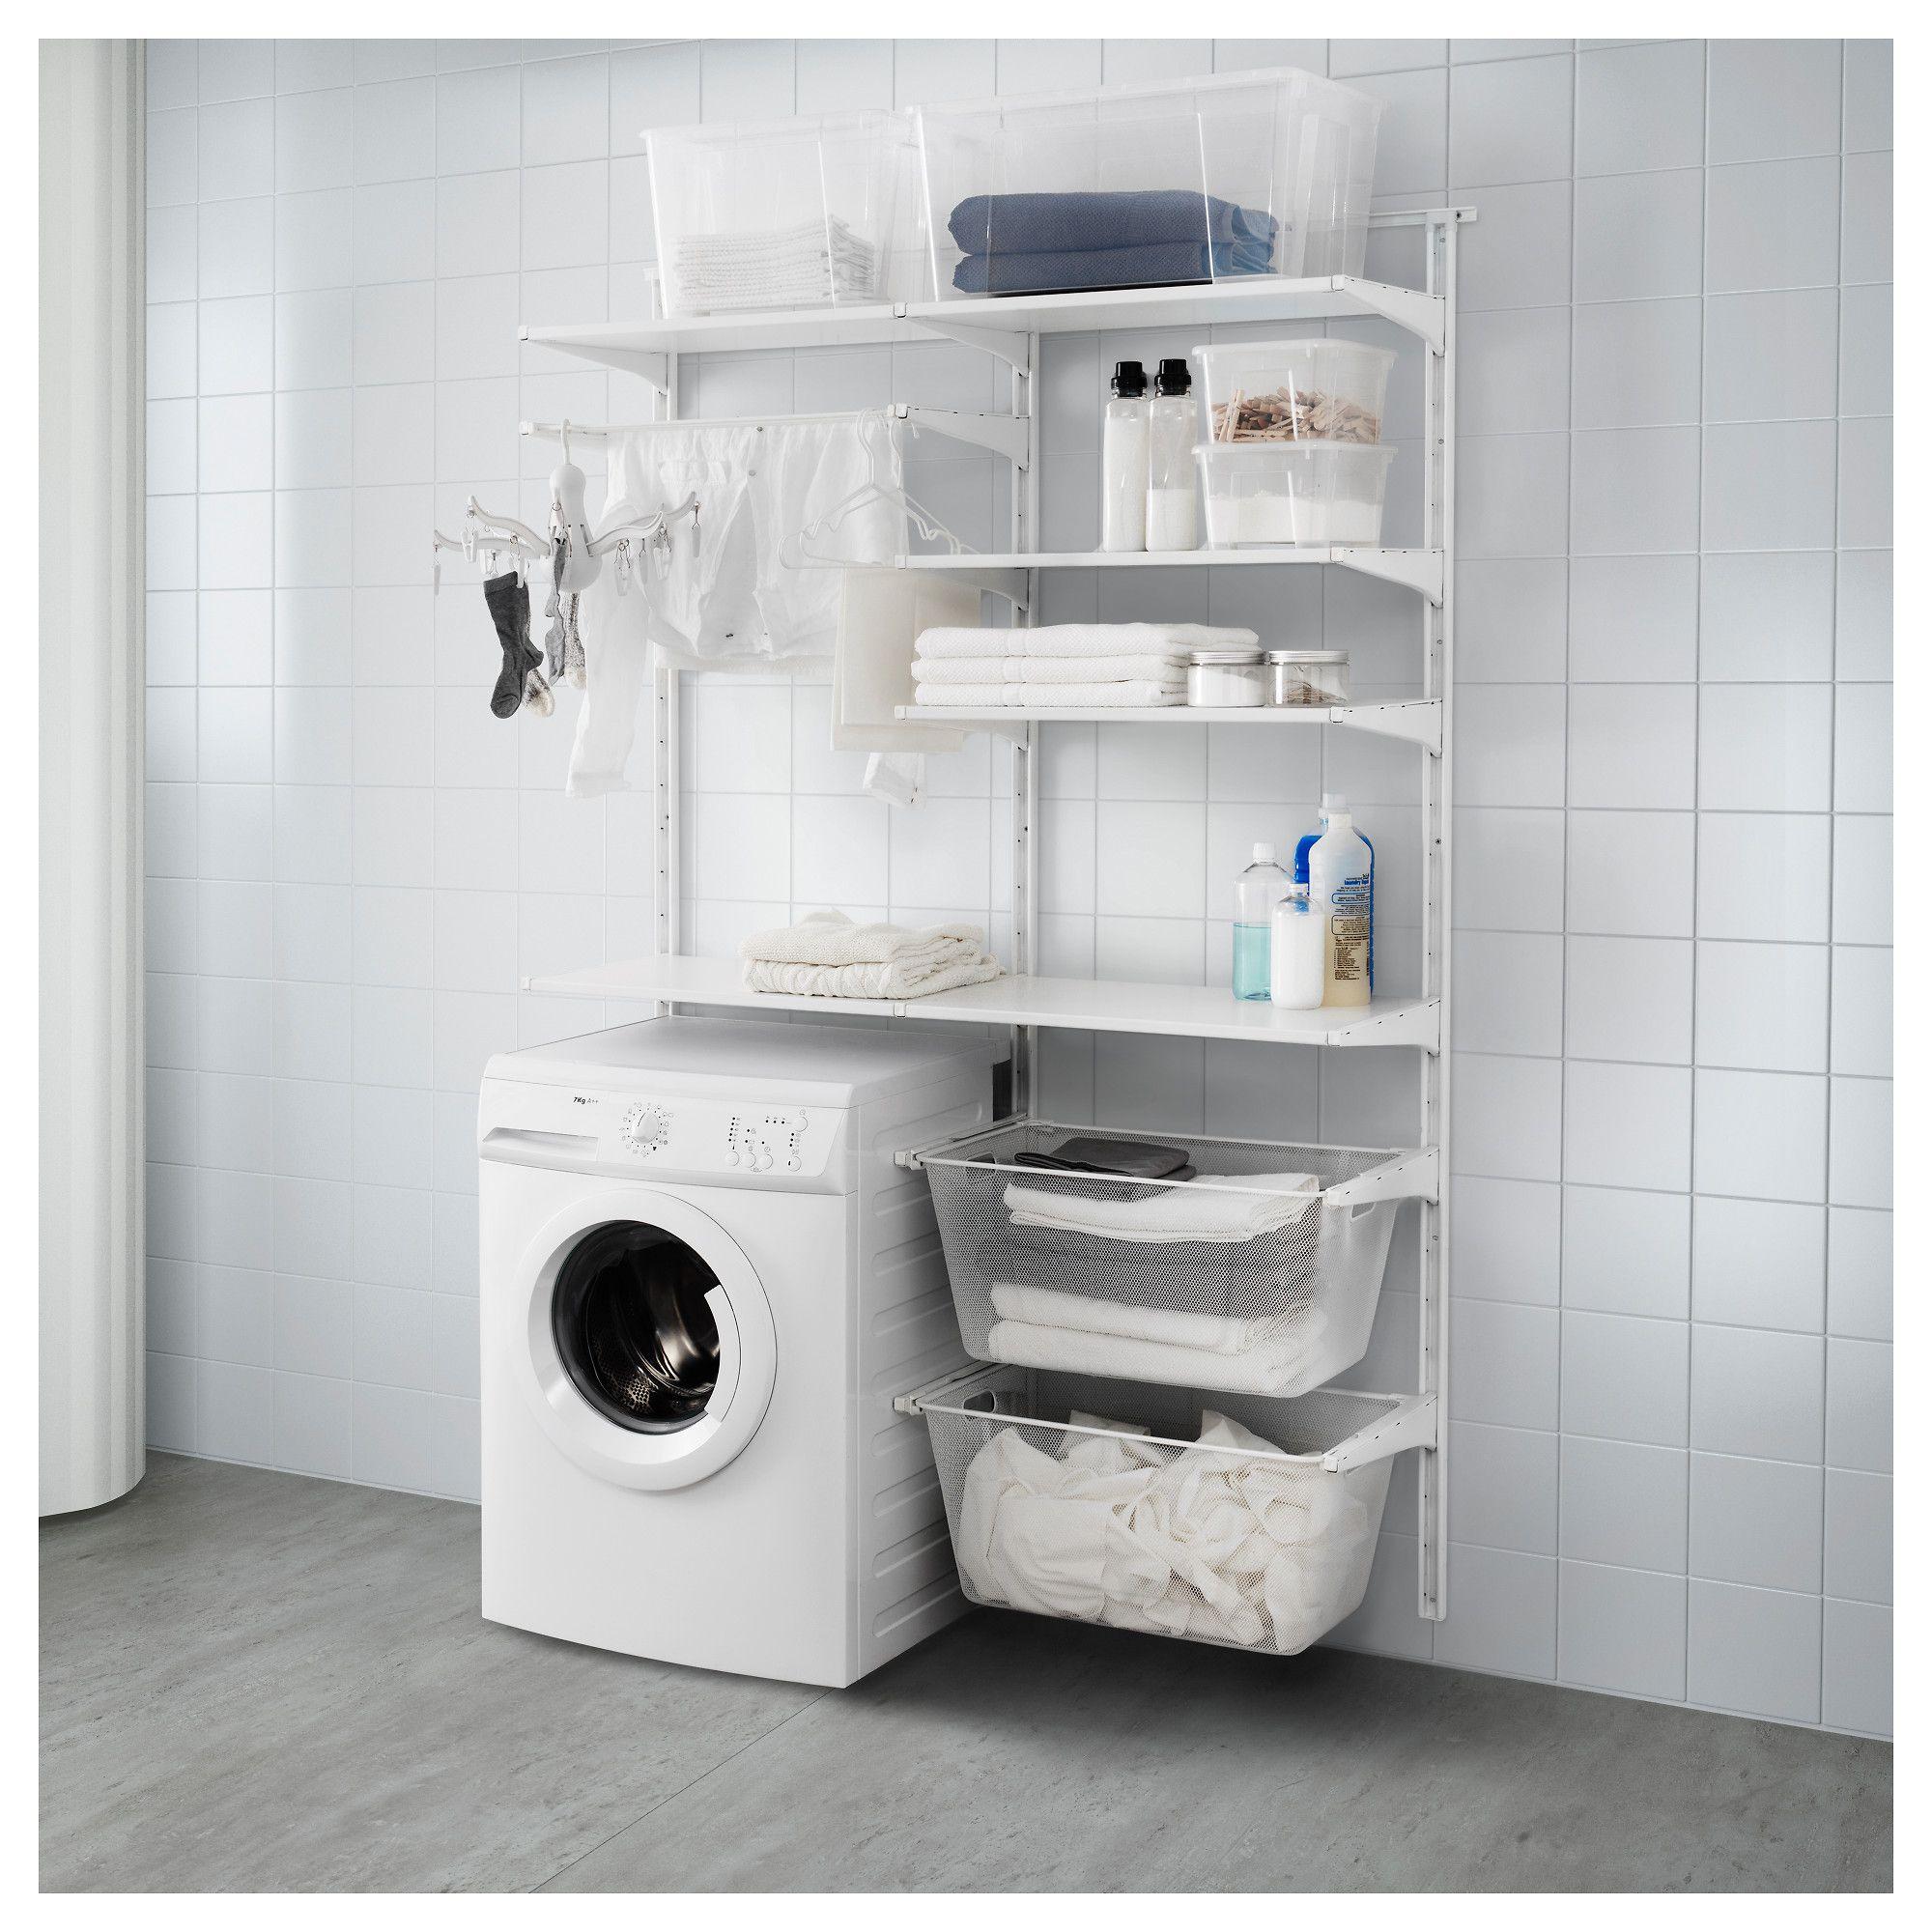 ikea algot wall upright shelves drying rack white pinterest rh pinterest com ikea shelves laundry room ikea laundry shelving